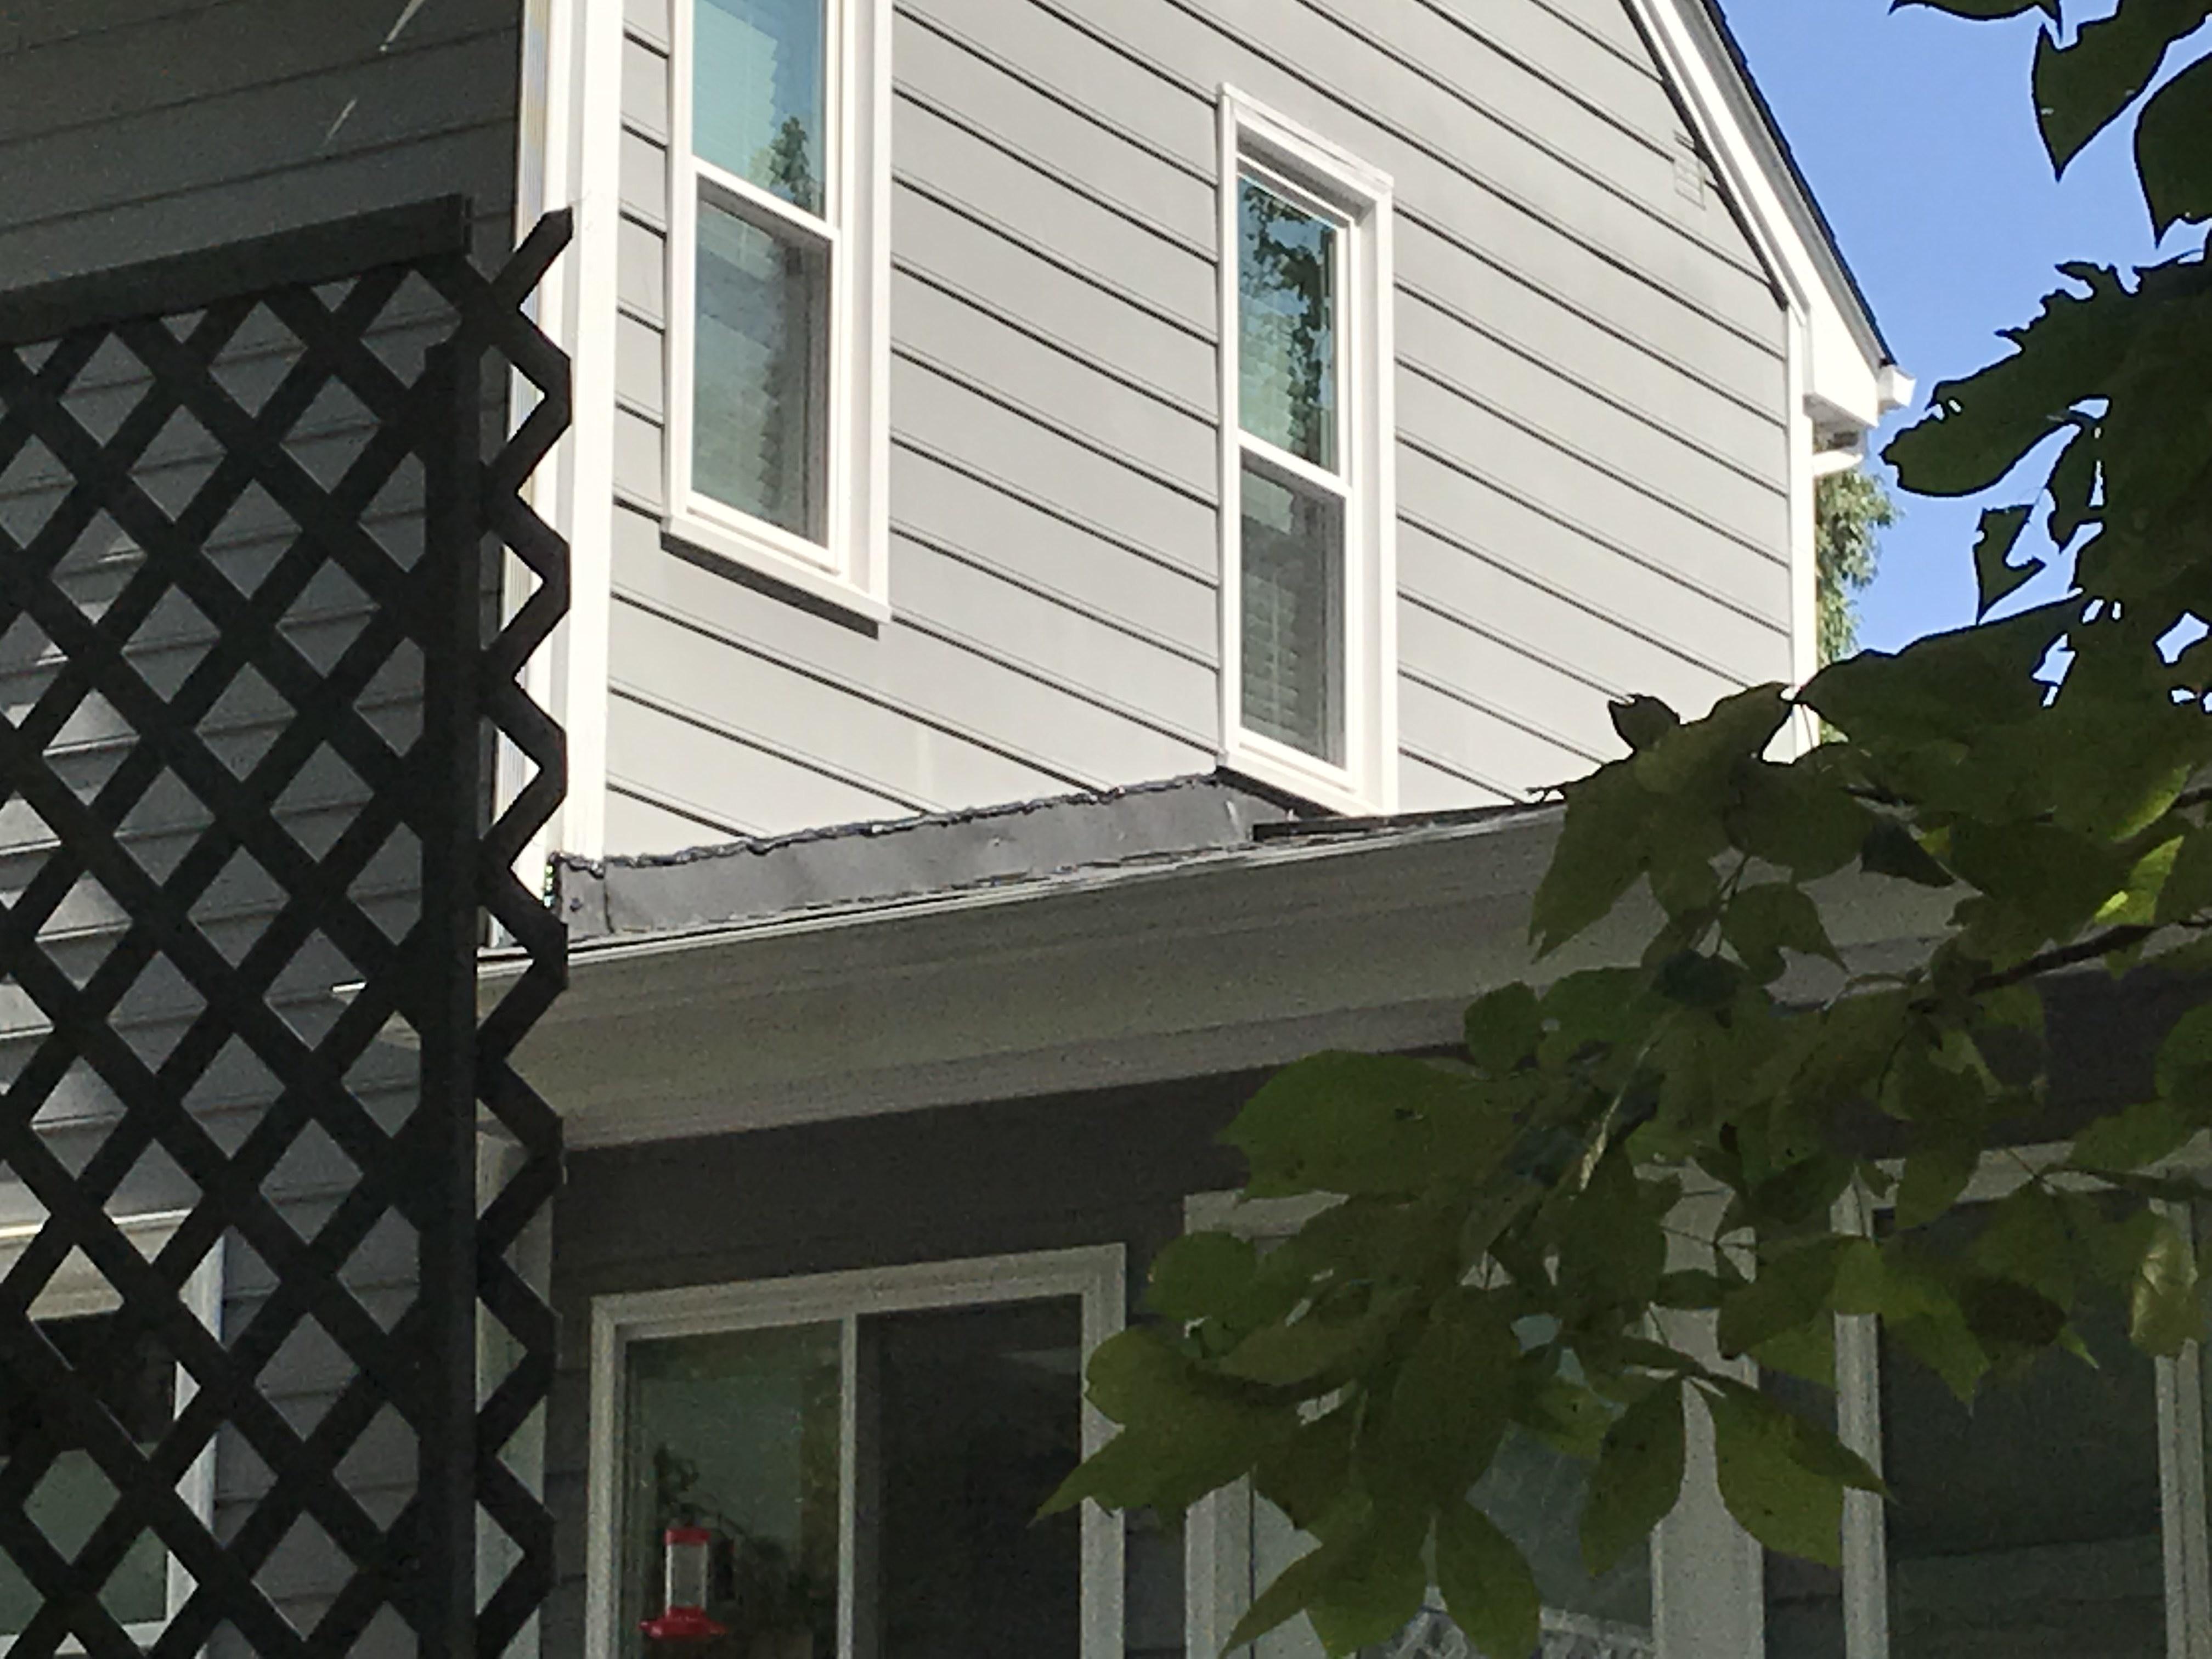 Incorrect Roof Flashing